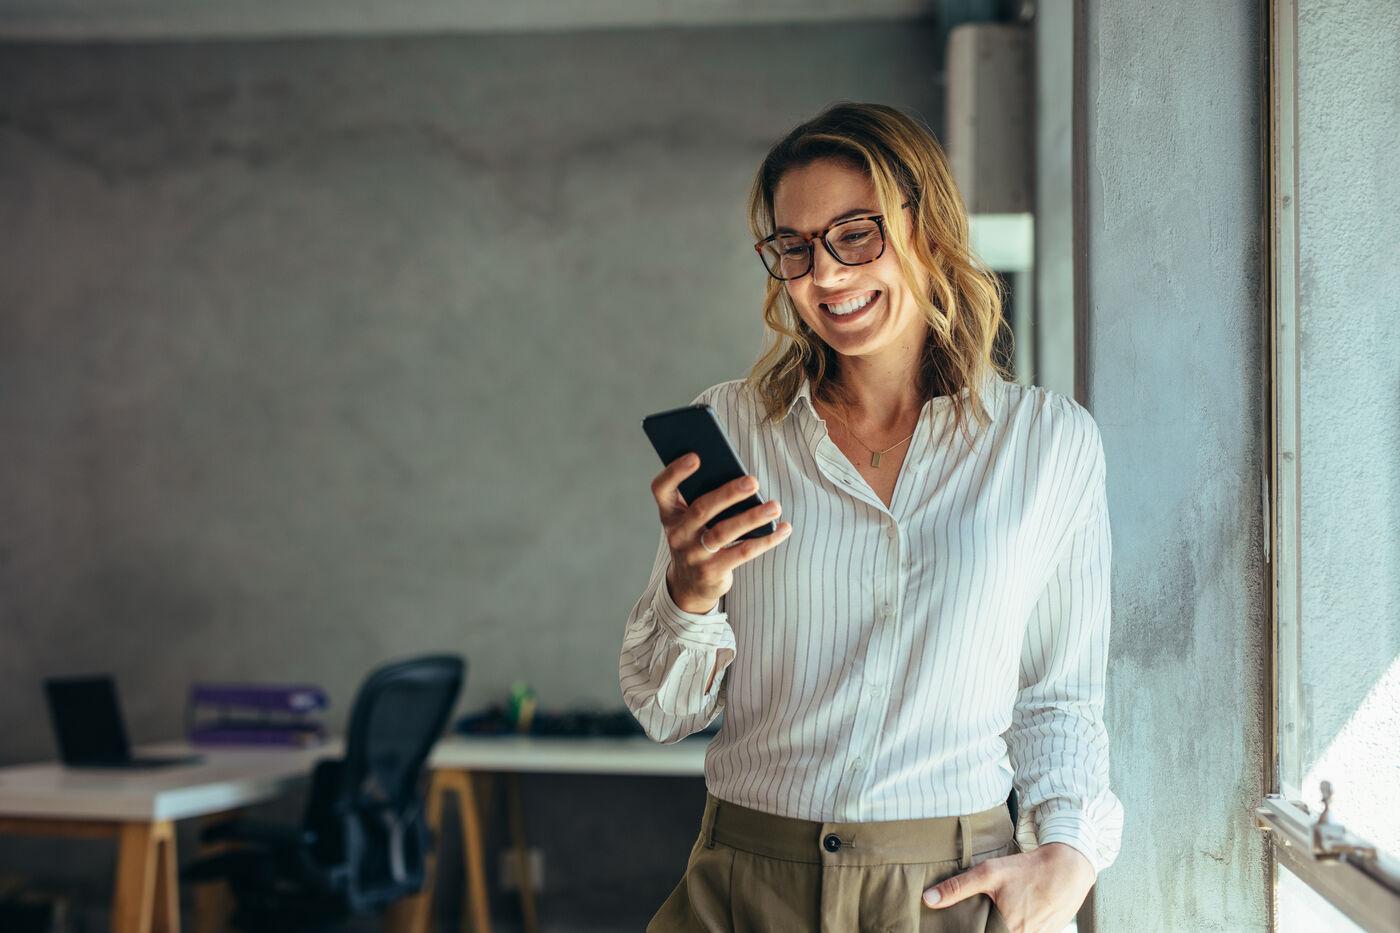 Referent der Geschäftsführung (m/w/d) mit Projektverantwortung - Job Heidelberg, Homeoffice - Jobs bei Discovergy - Application form